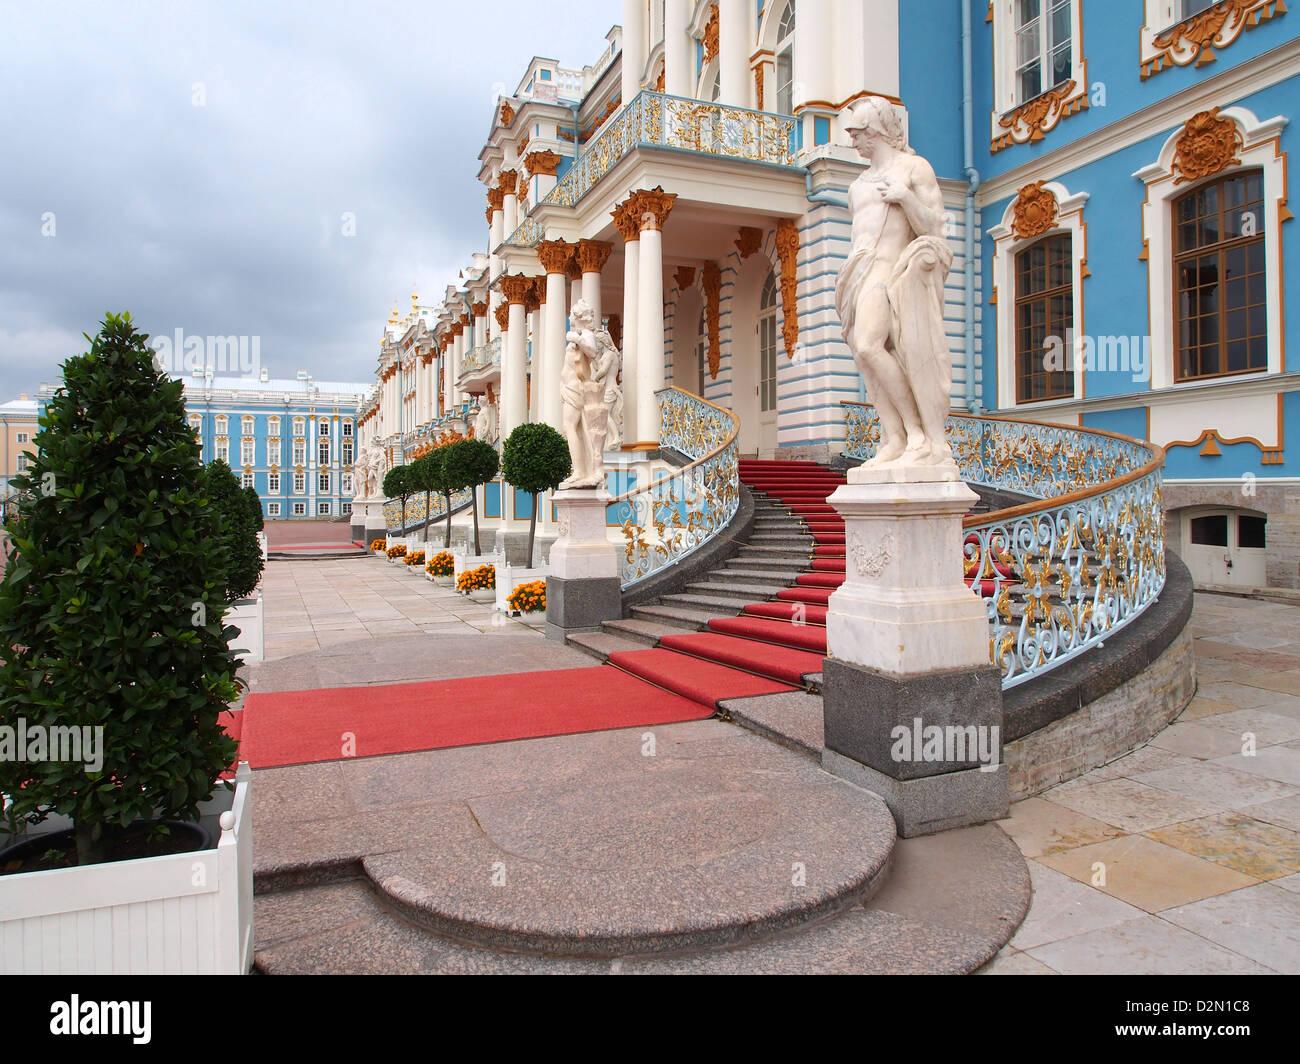 West end, Catherine Palace, Tsarskoye Selo (Pushkin), near St. Petersburg, Russia, Europe - Stock Image